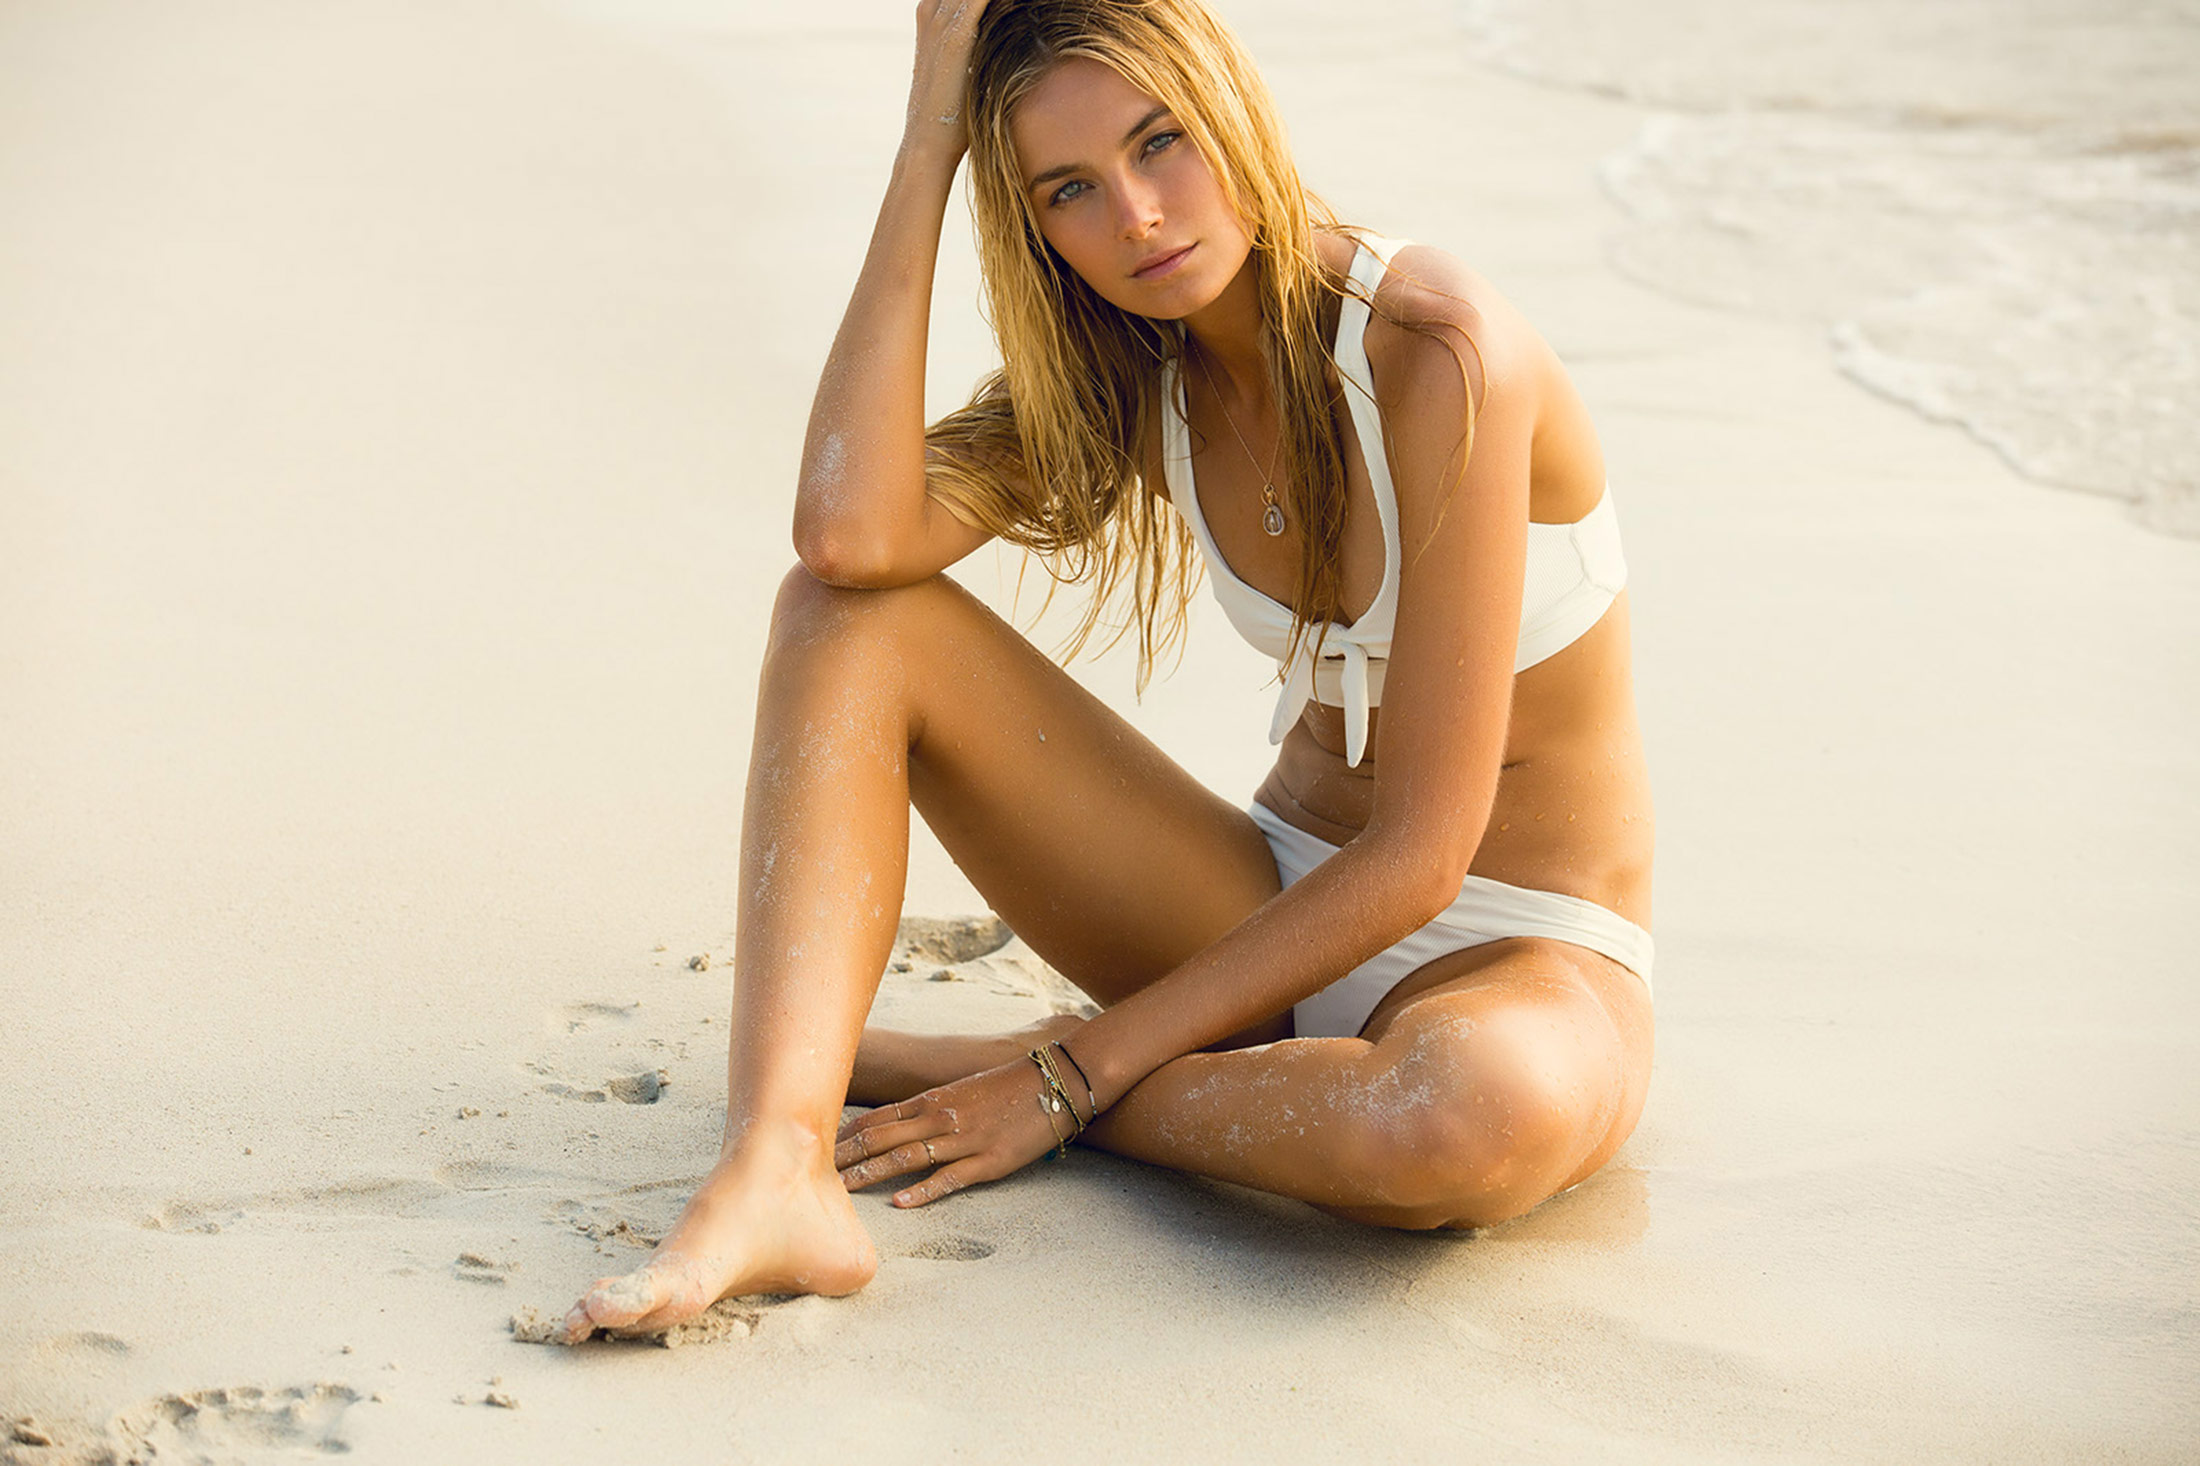 Feet Aubrey O'Day nude (91 foto and video), Sexy, Bikini, Instagram, lingerie 2019